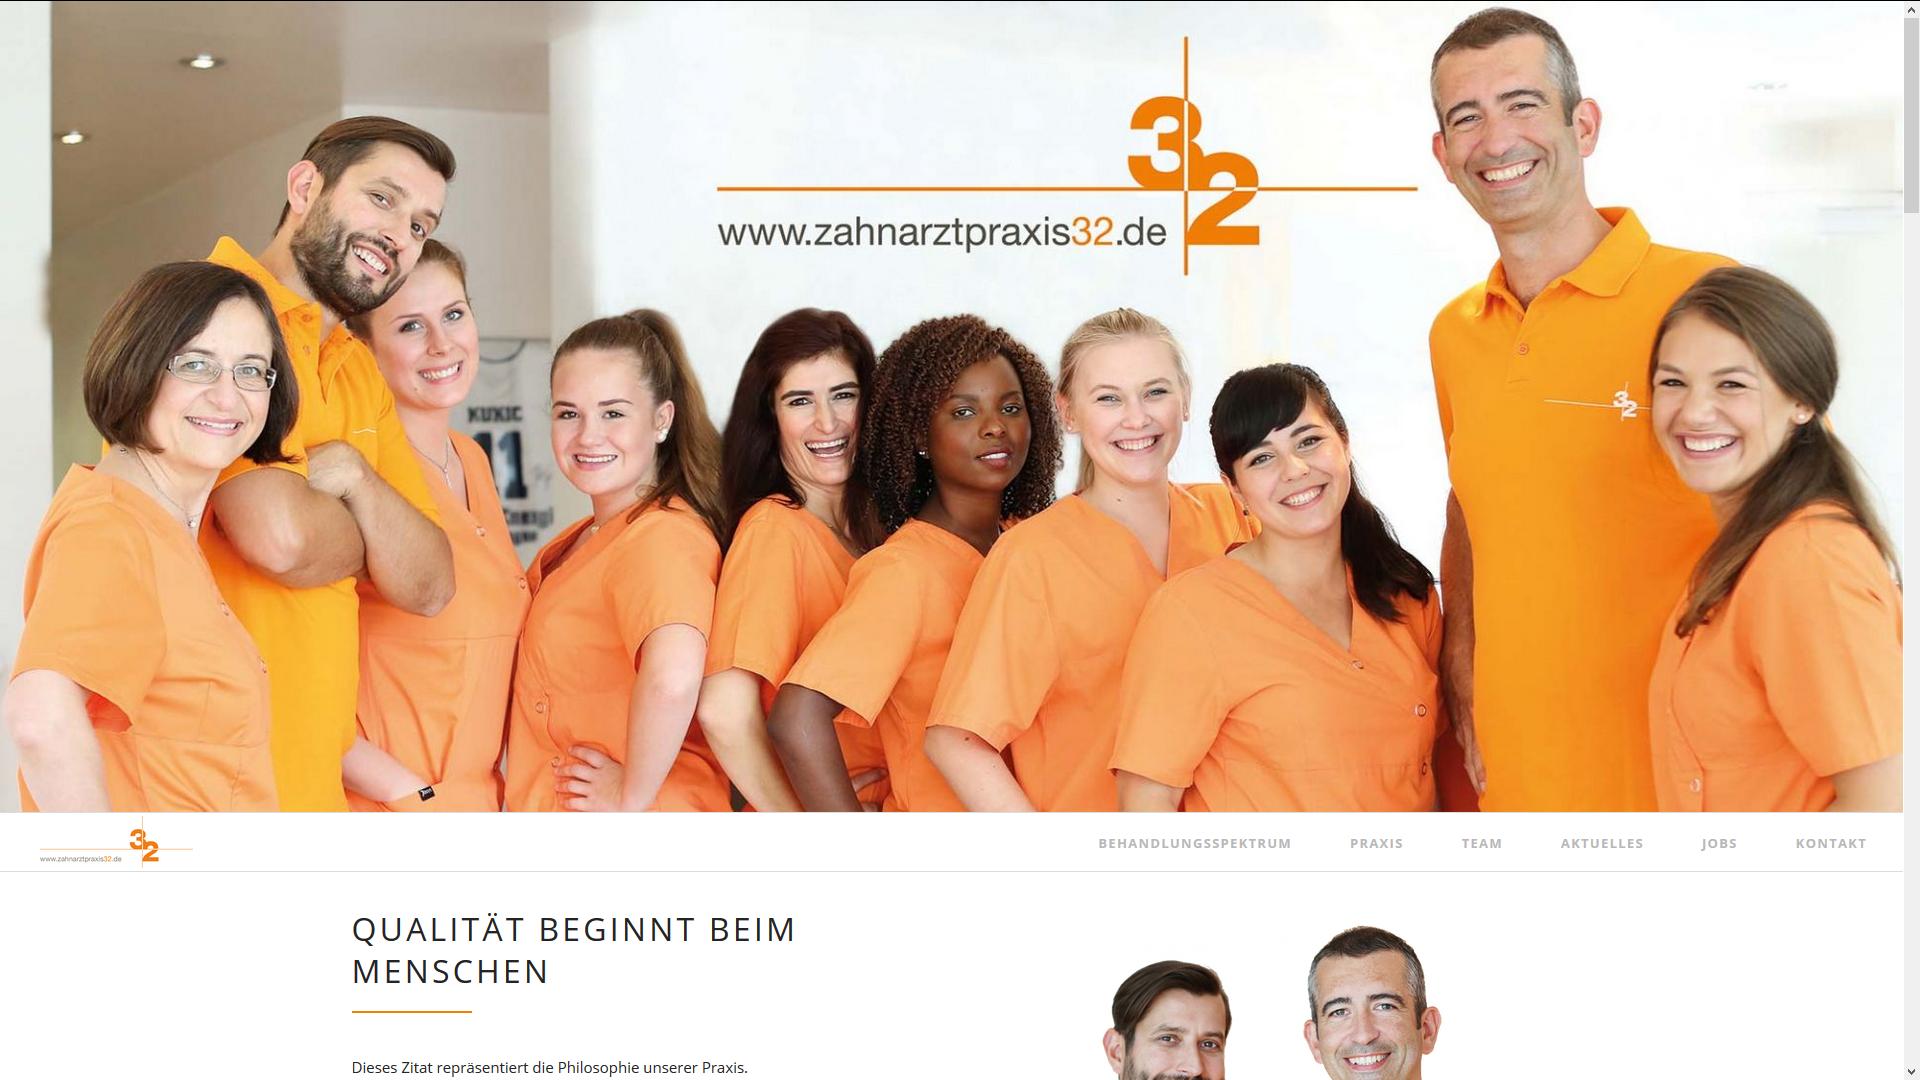 zahnarztpraxis32